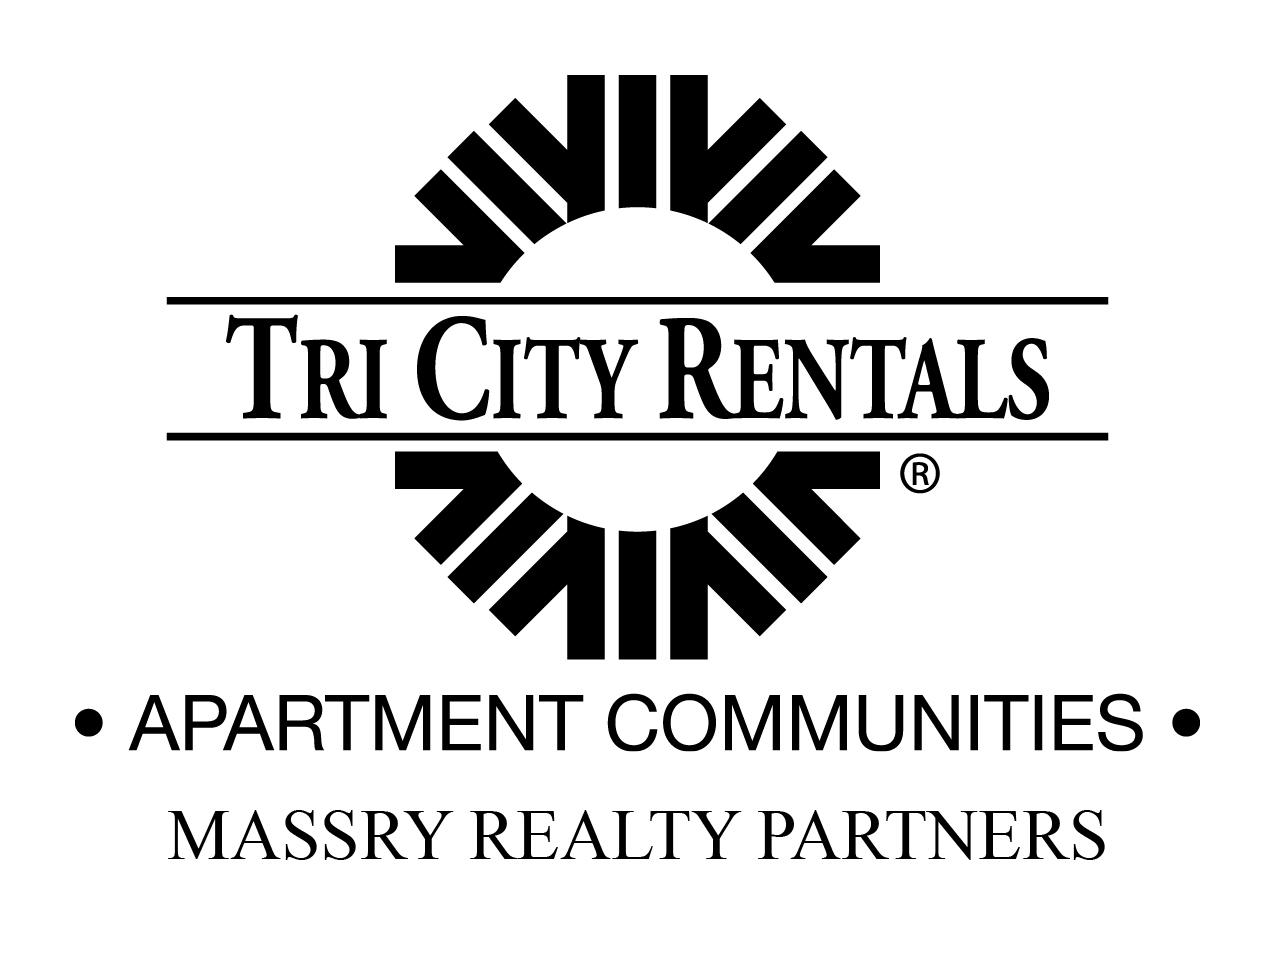 Tri City Rentals Massry